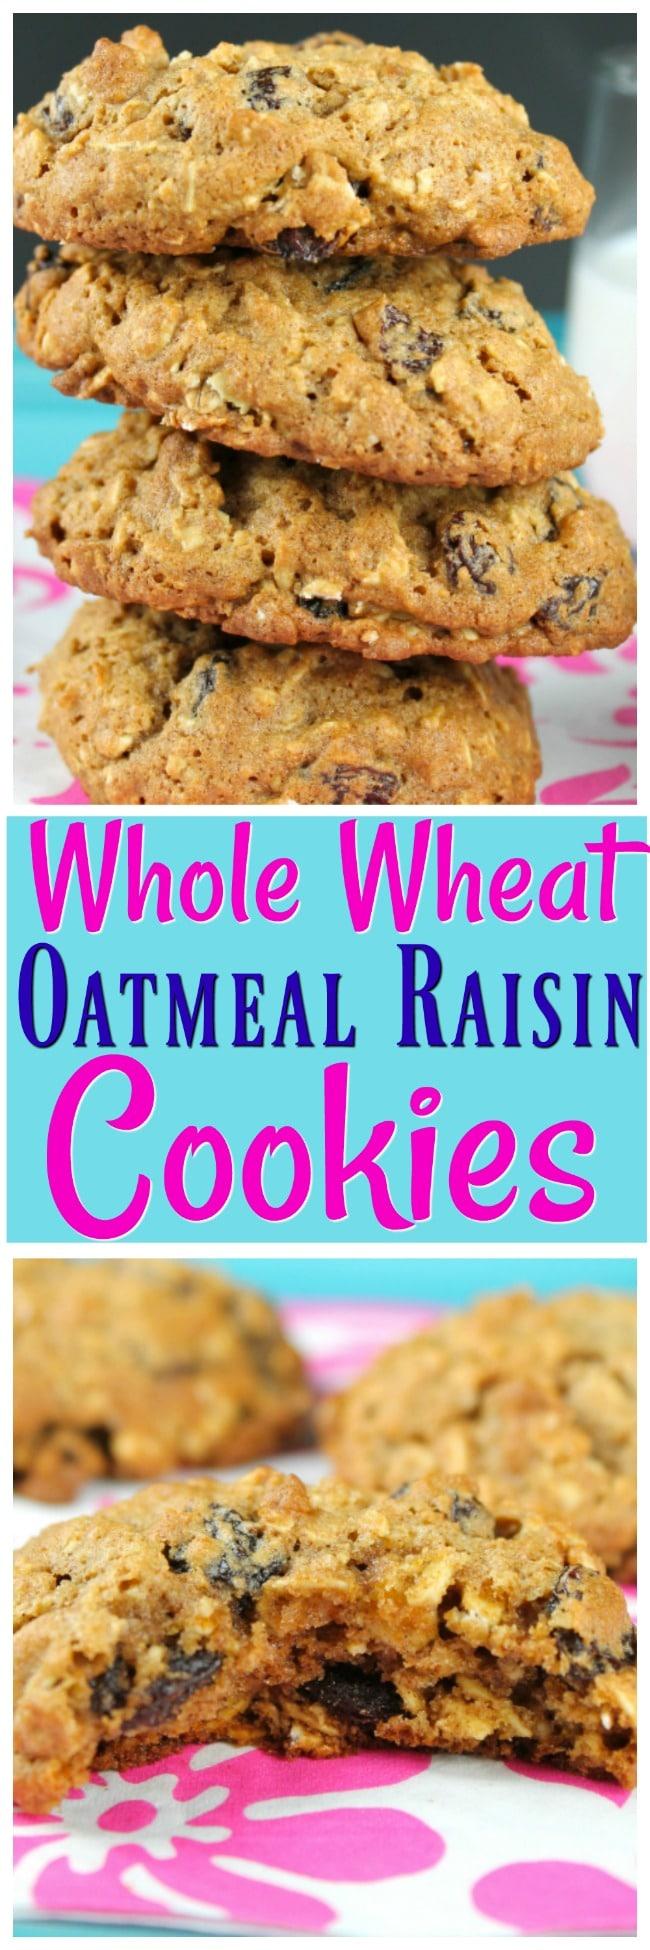 Whole Wheat Raisin Cookies Collage